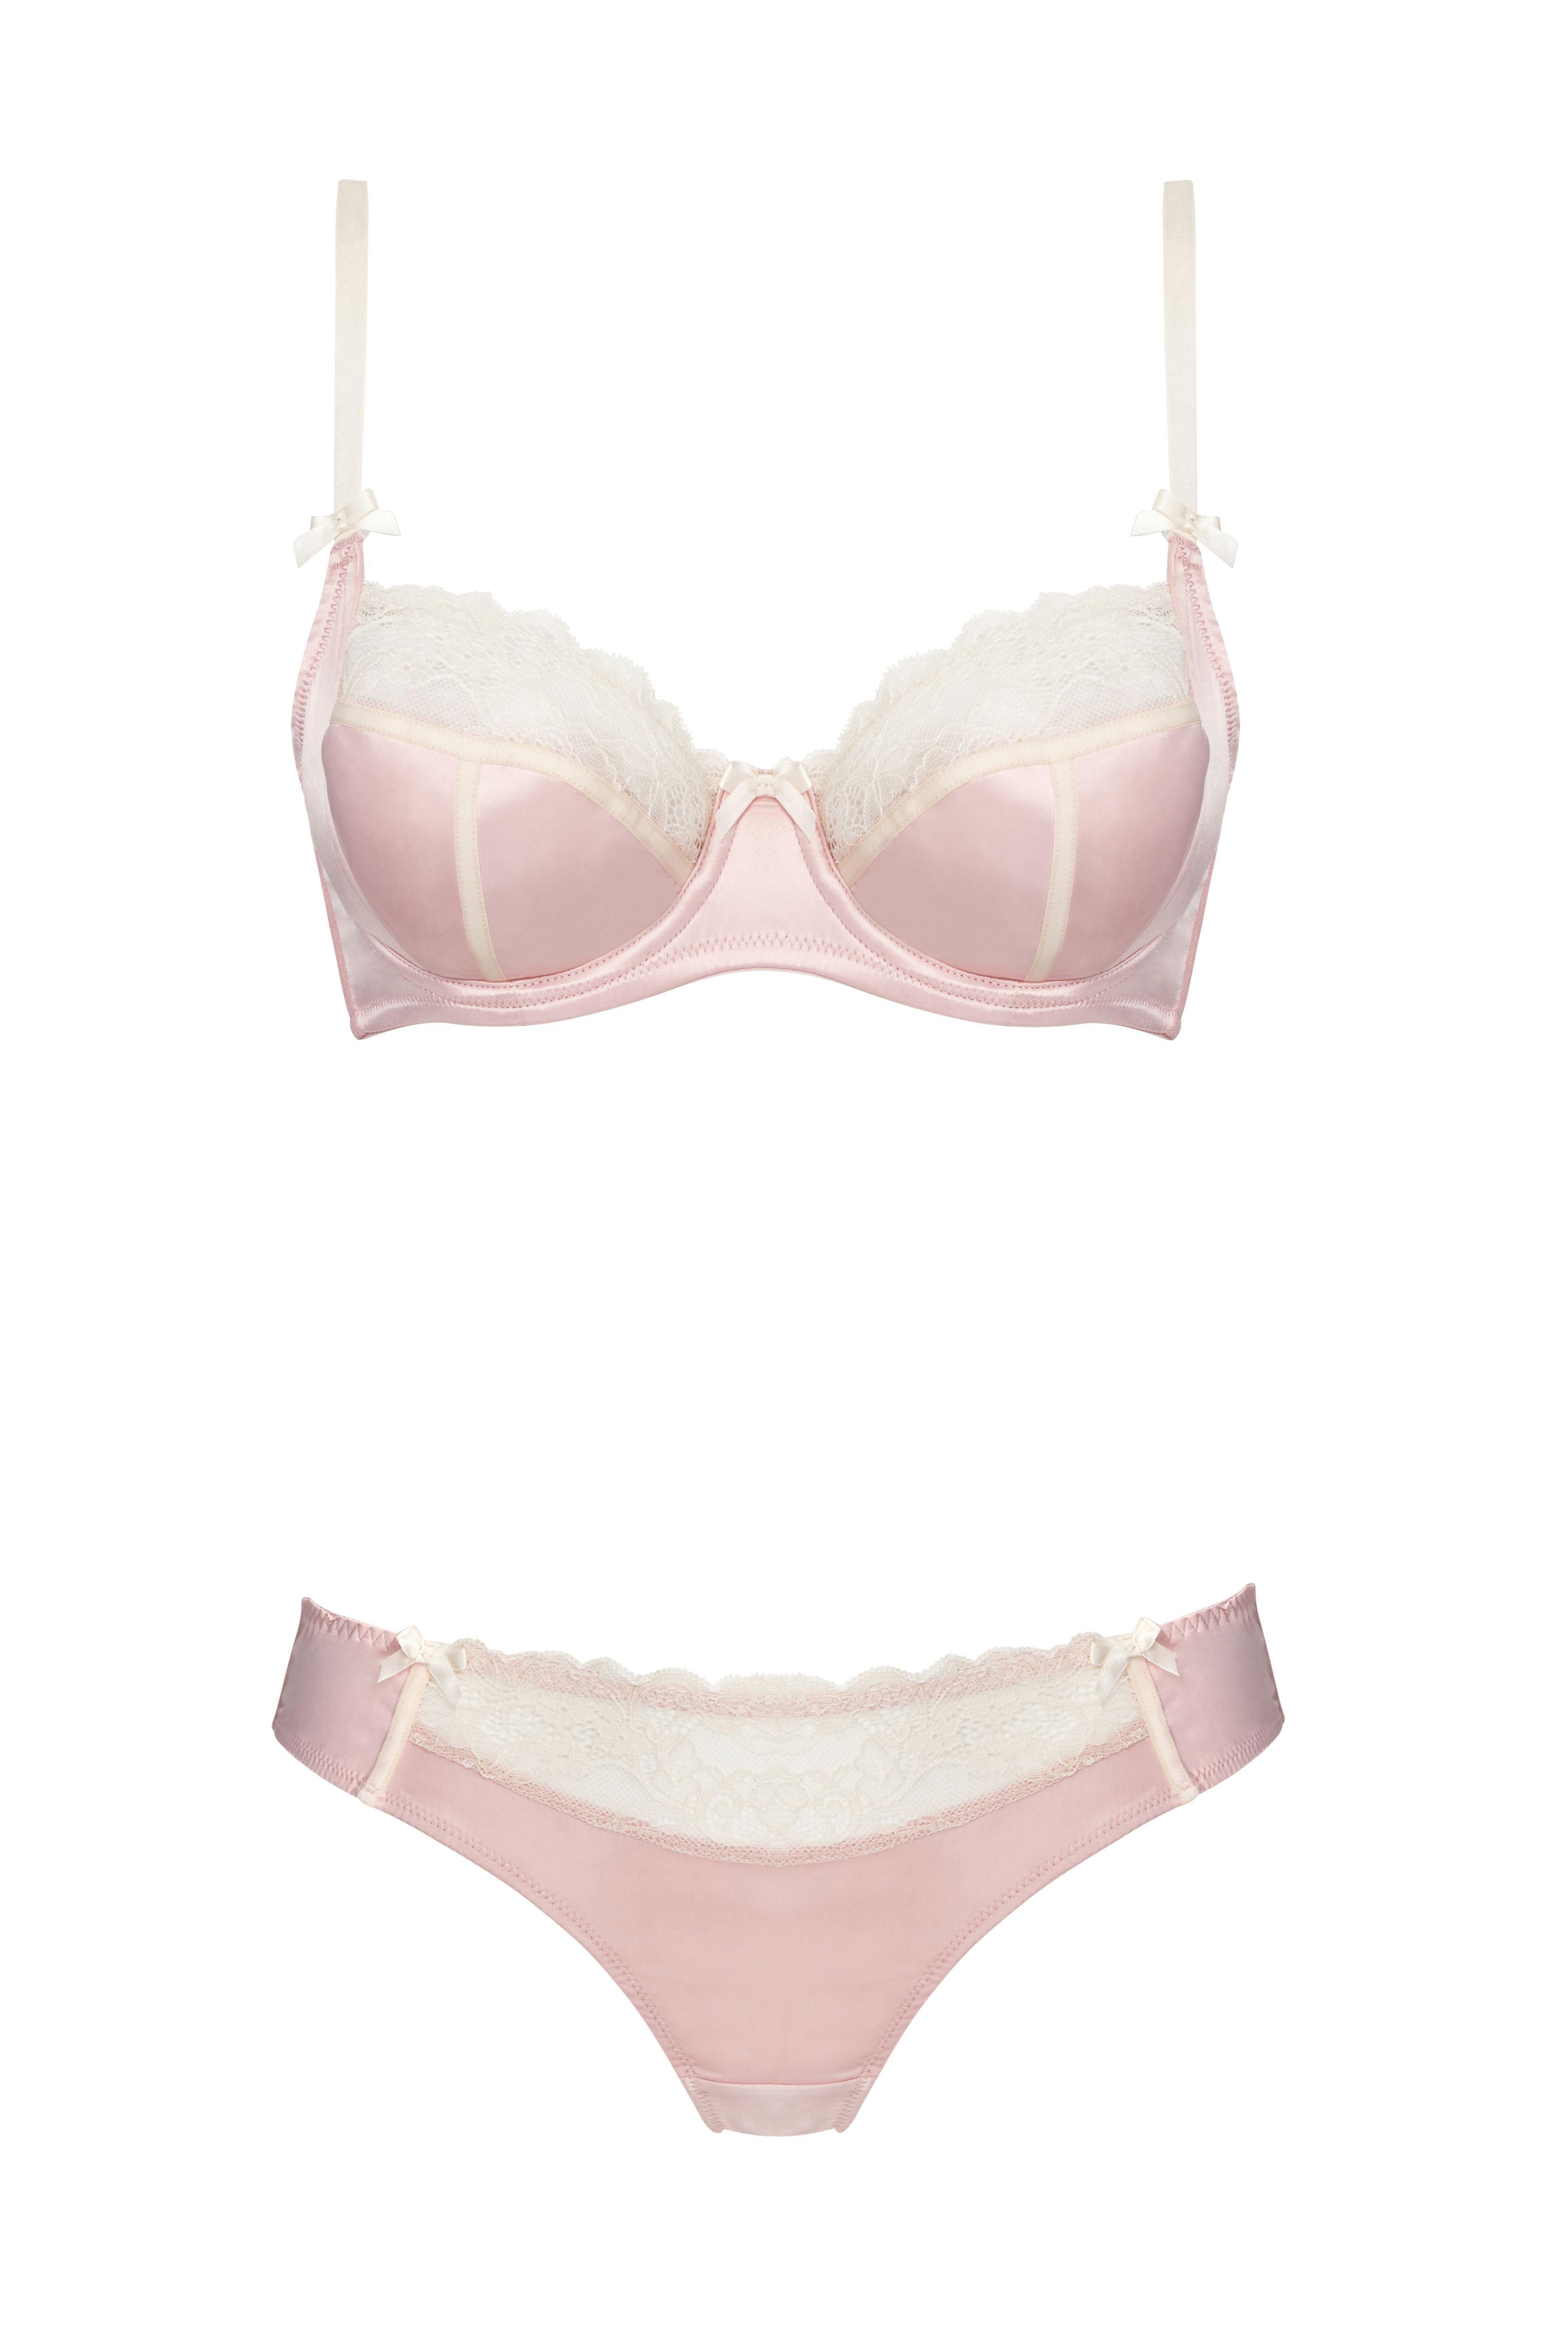 Affinitas Intimates SS15 Nadia Unlined Wire Bra and Bikini Brief ...